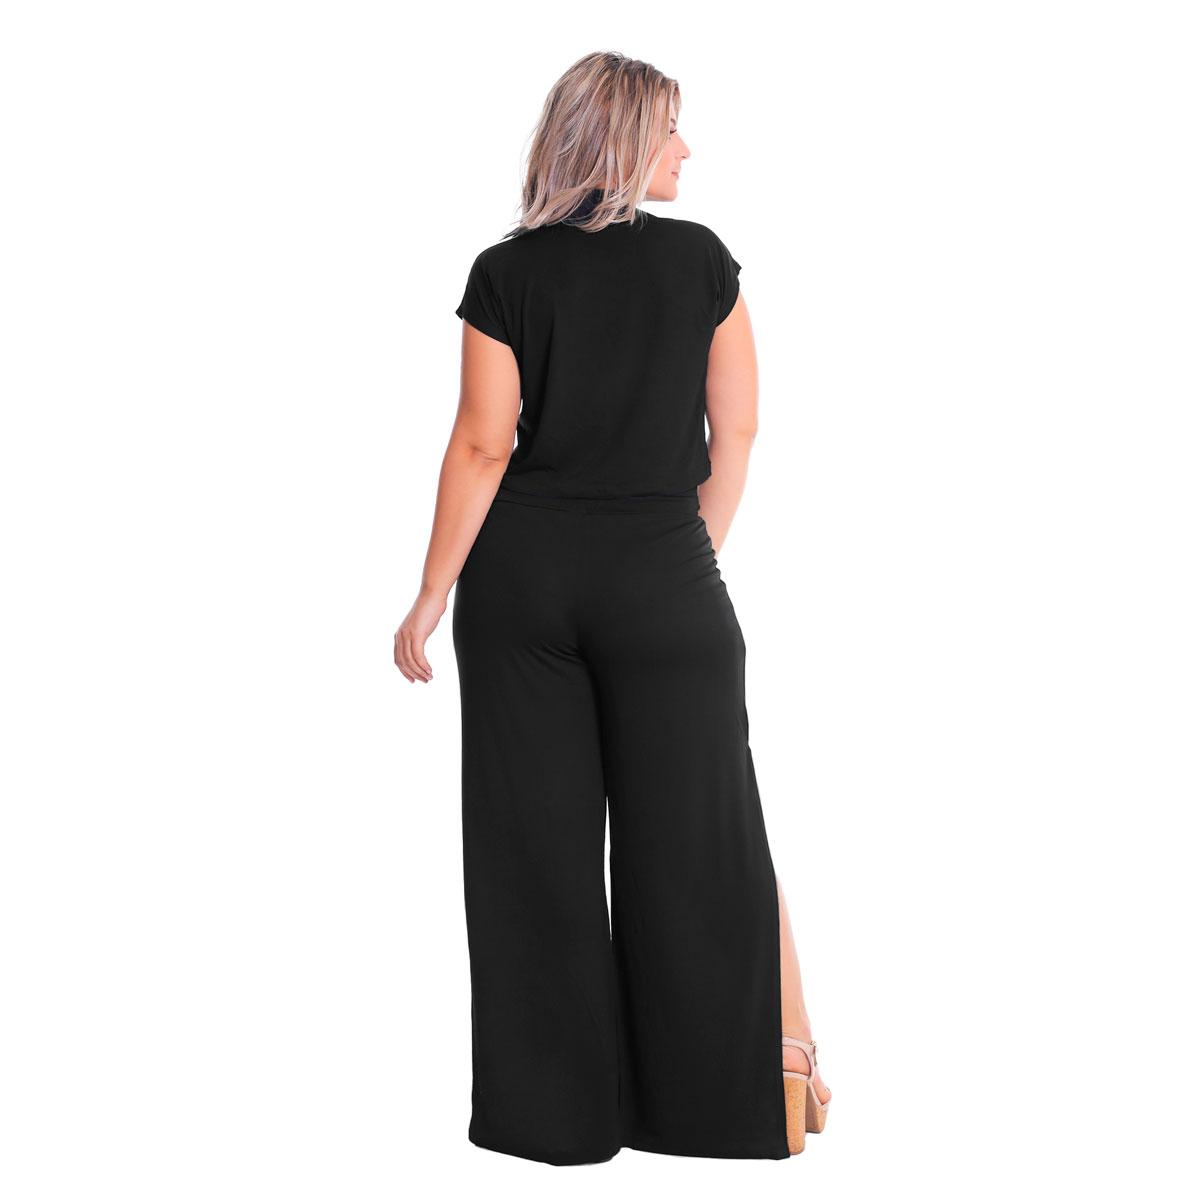 Calça Pantalona Laterais Abertas Cintura Alta Plus Size Lynnce